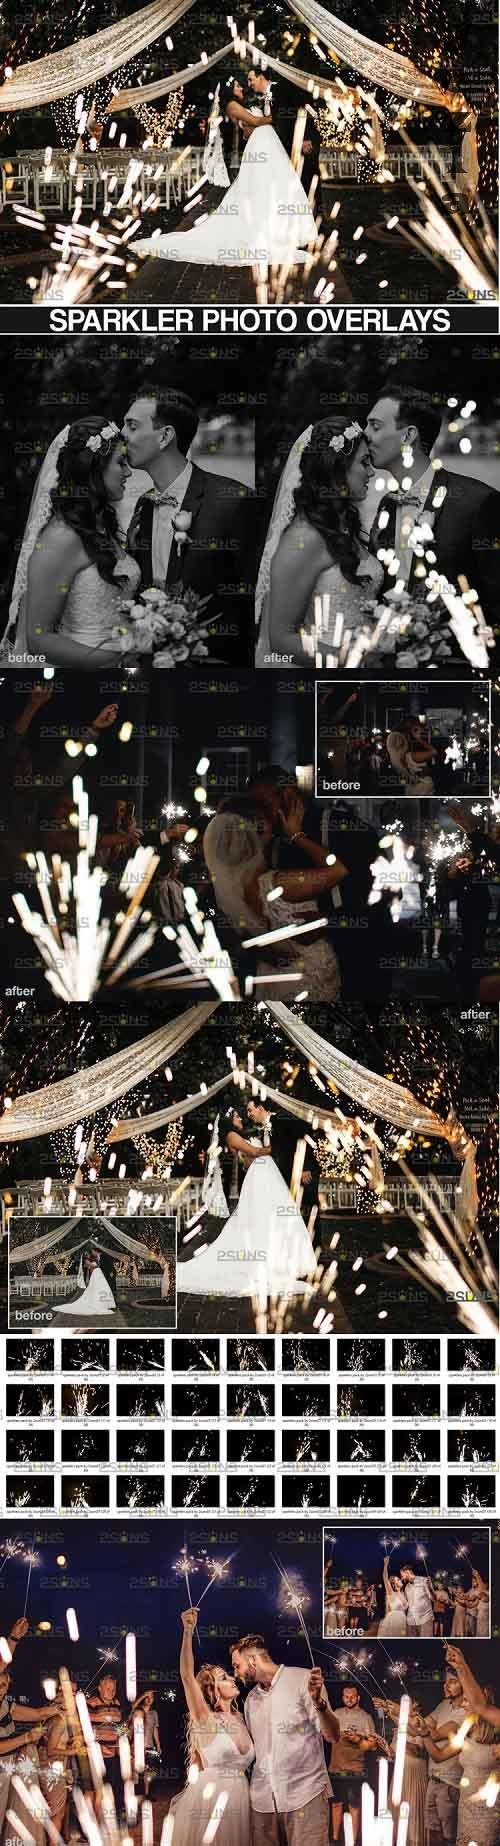 Wedding sparkler overlays Photoshop overlay - 995013